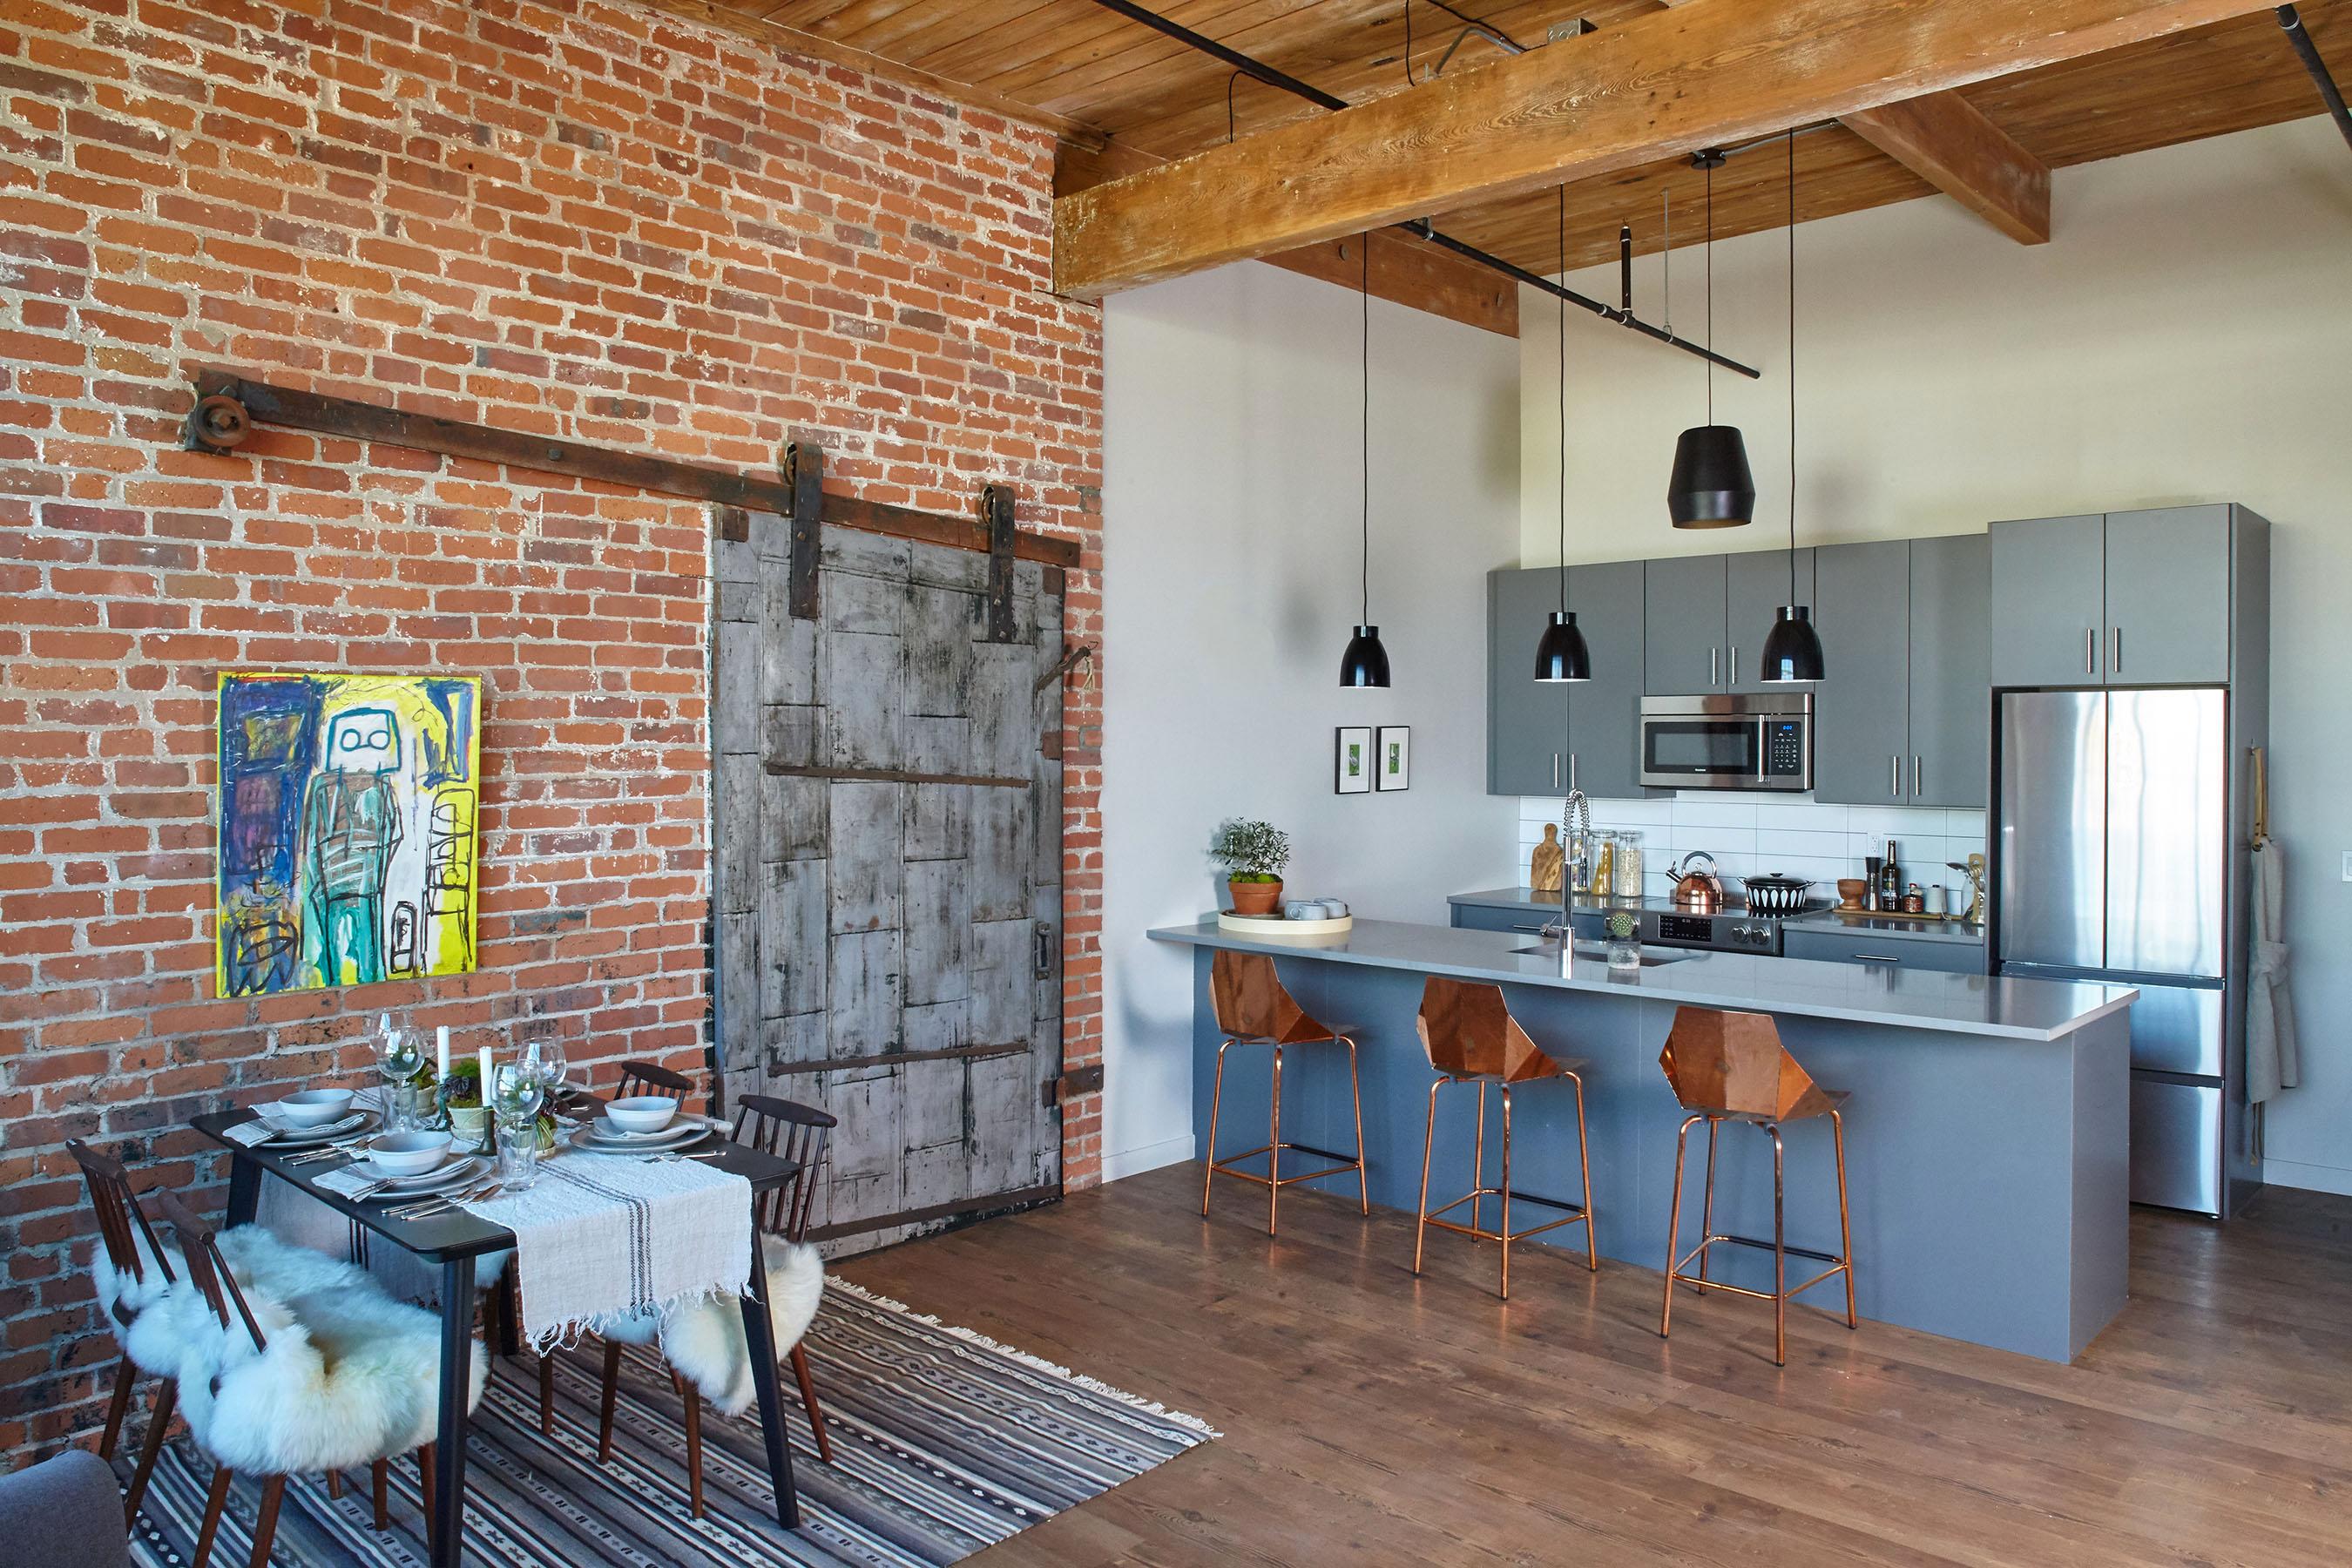 11 Chesrnut Street kitchen